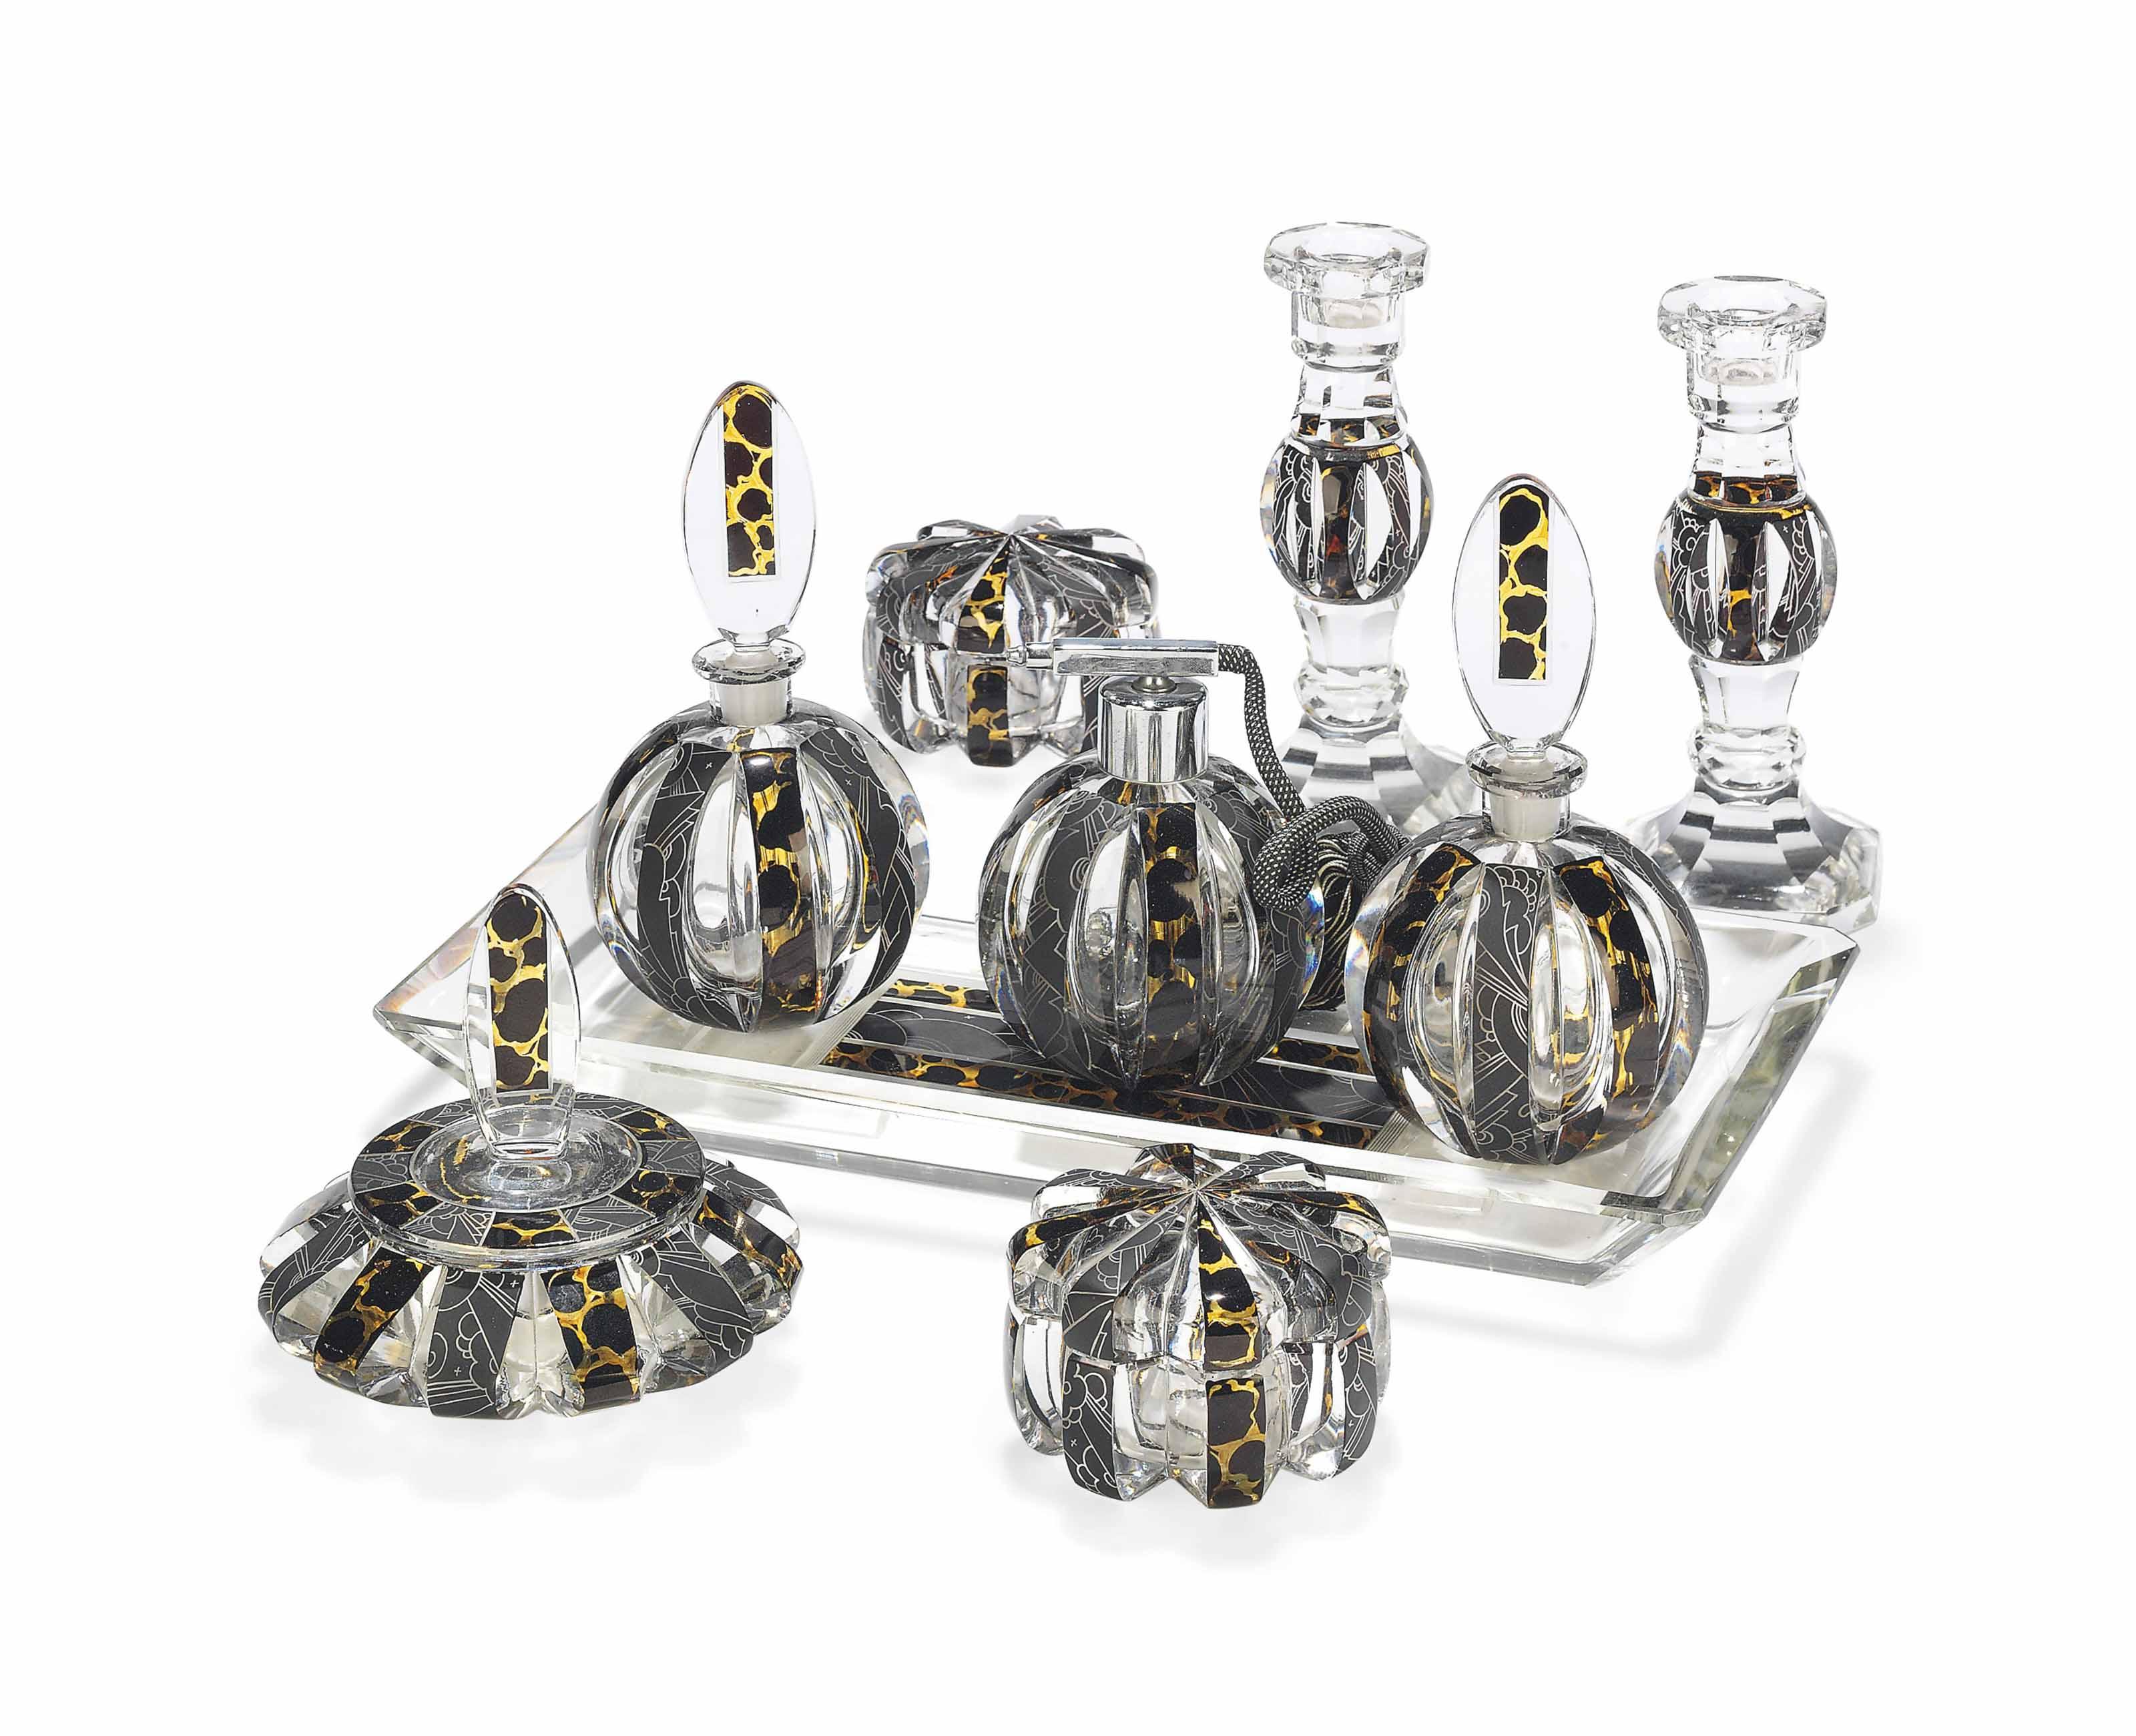 AN ART DECO-STYLE CUT-GLASS DRESSING TABLE SET